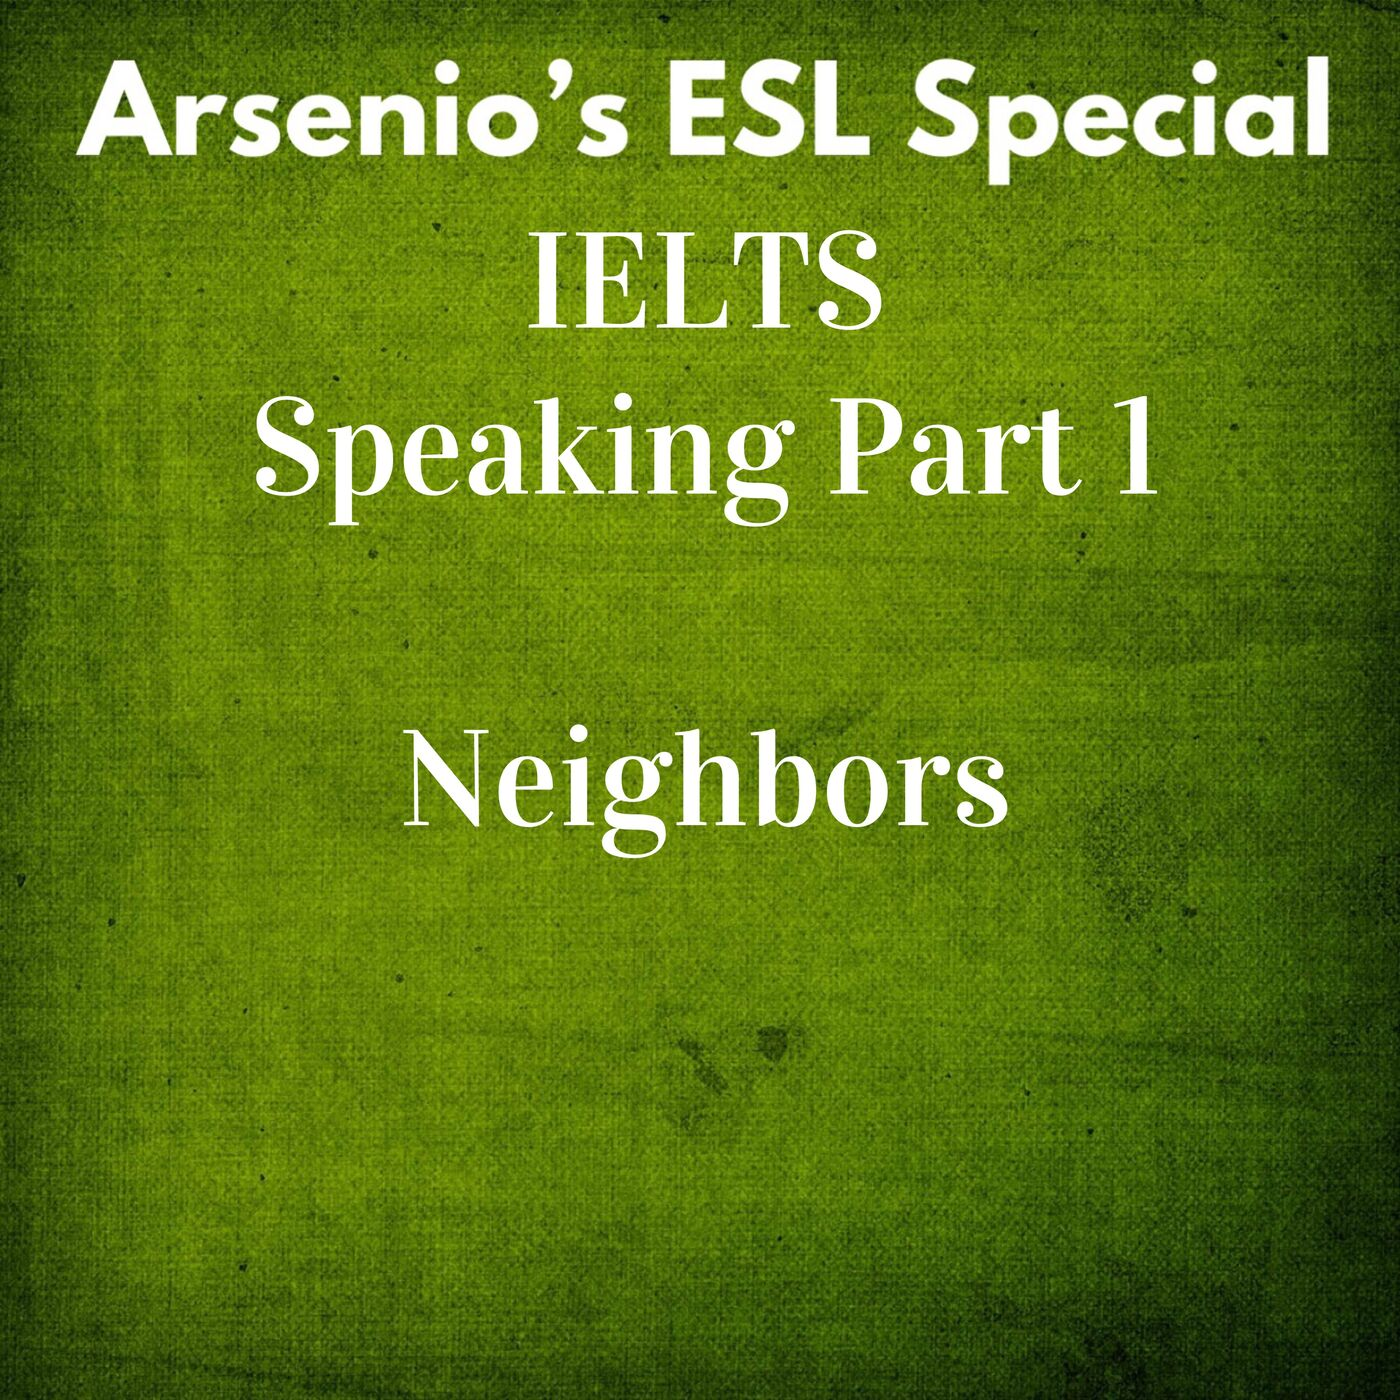 Arsenio's ESL Podcast: Special - IELTS Speaking - Part I - Neighbors